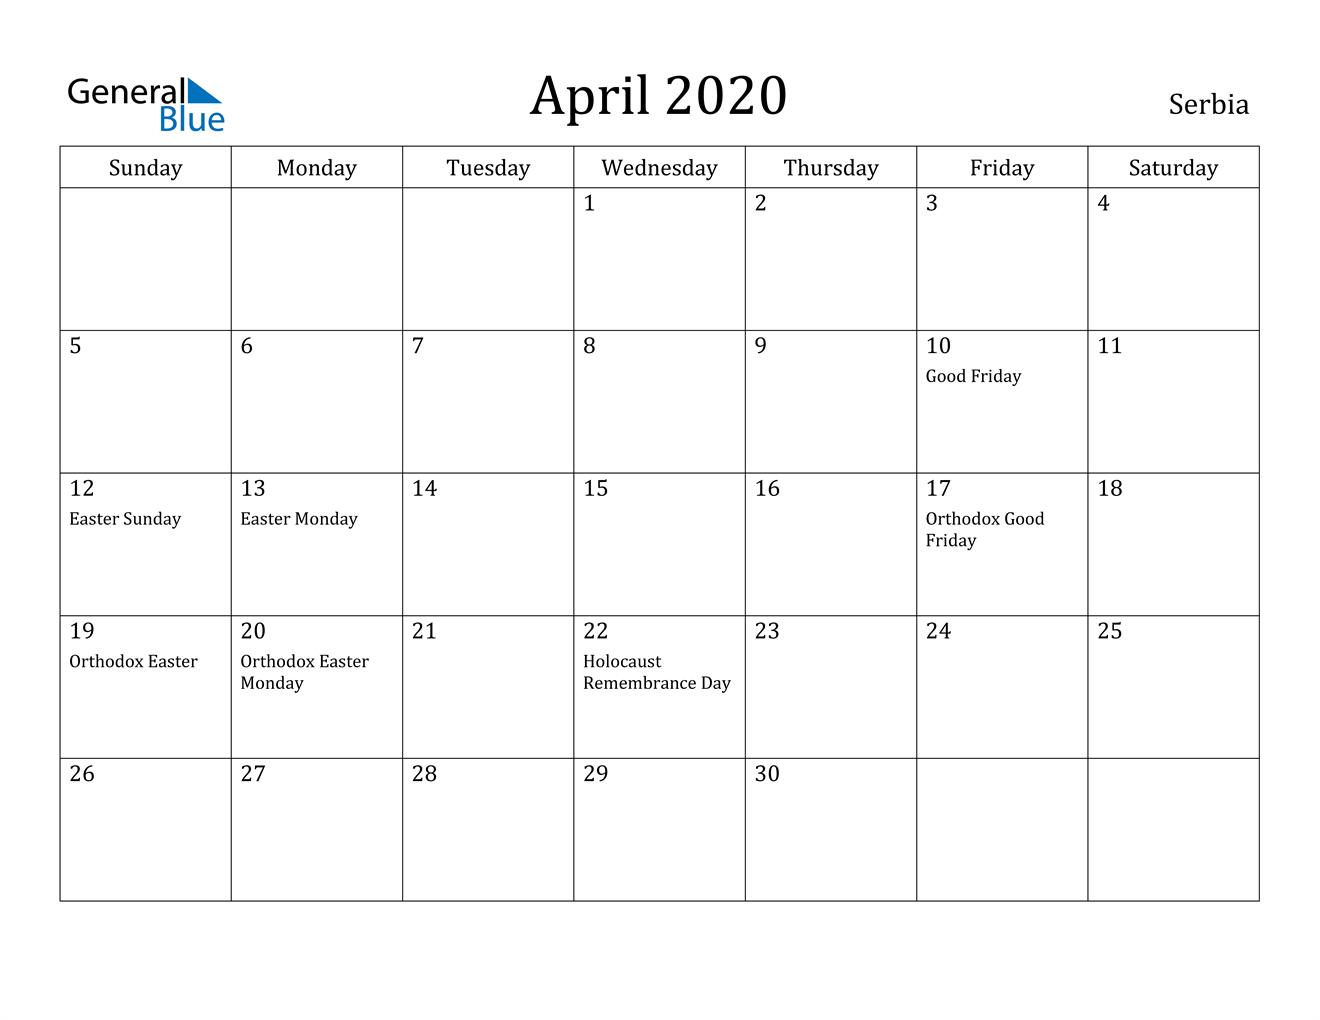 Image of April 2020 Serbia Calendar with Holidays Calendar